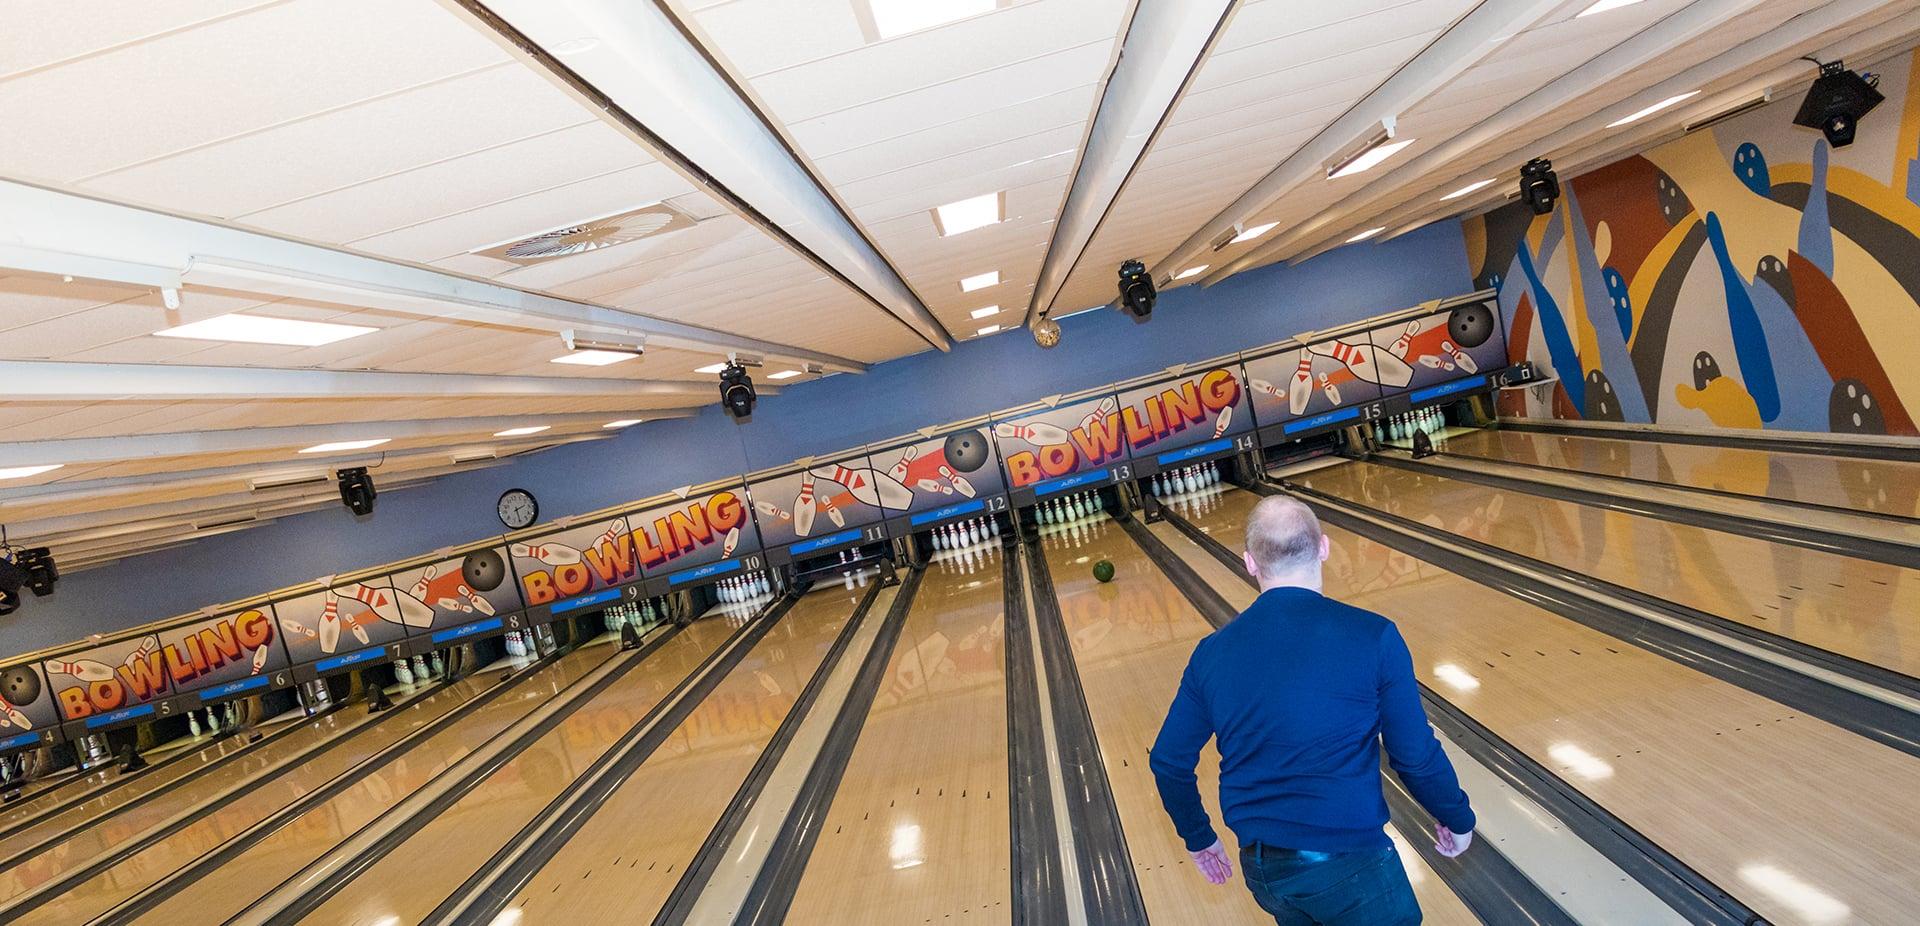 bowlingbane Roskilde